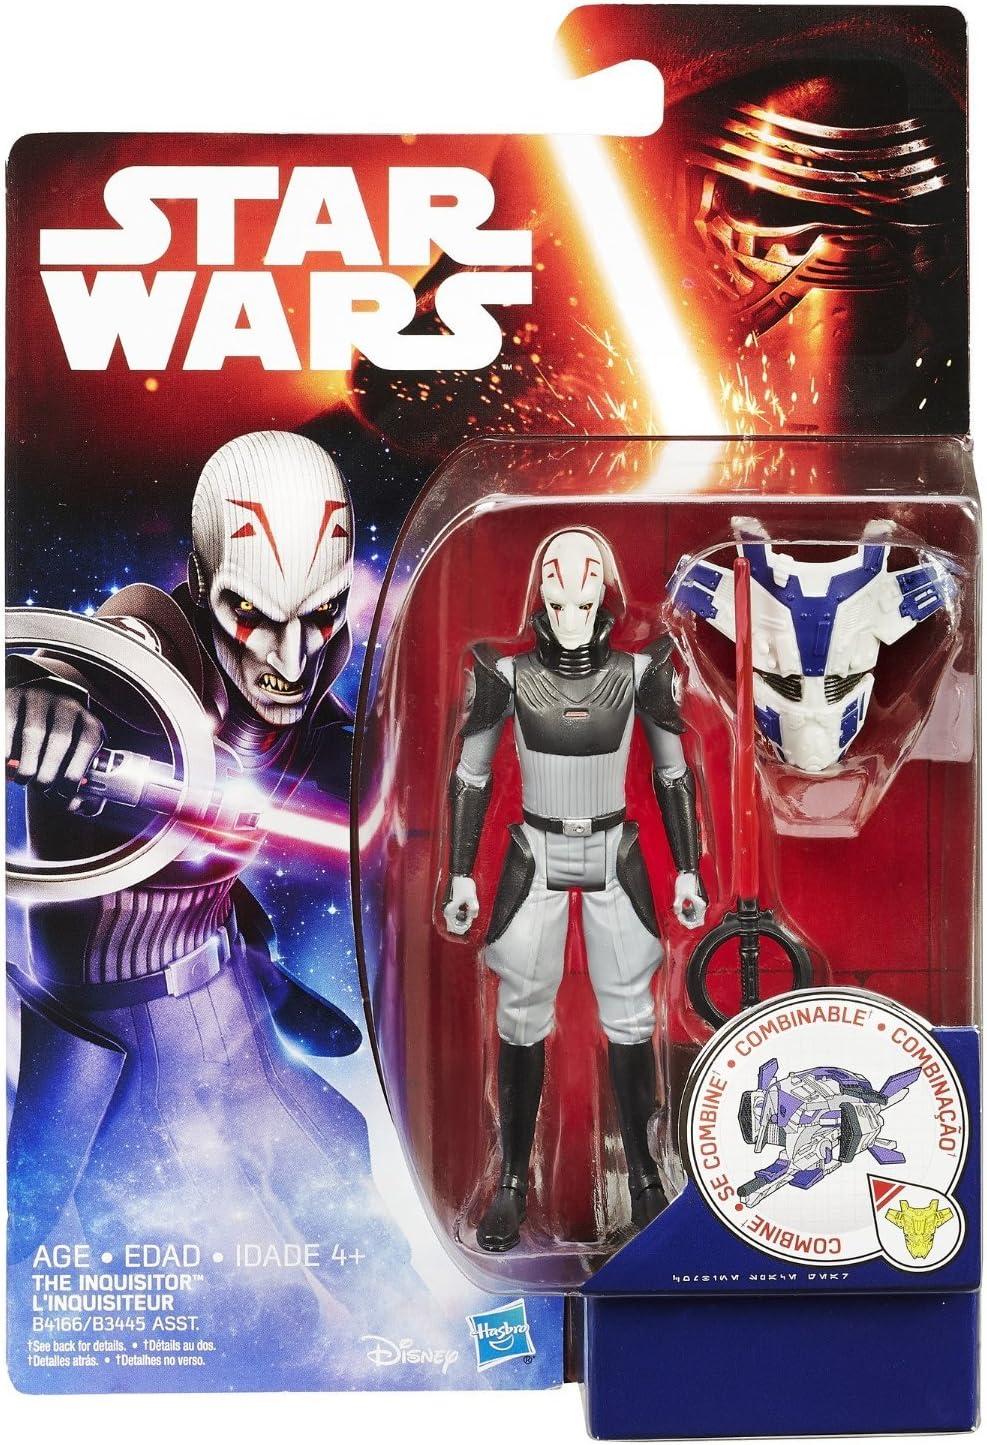 LUKE SKYWALKER Star Wars EP 7 VII The Force Awakens Jungle Space Action Figure